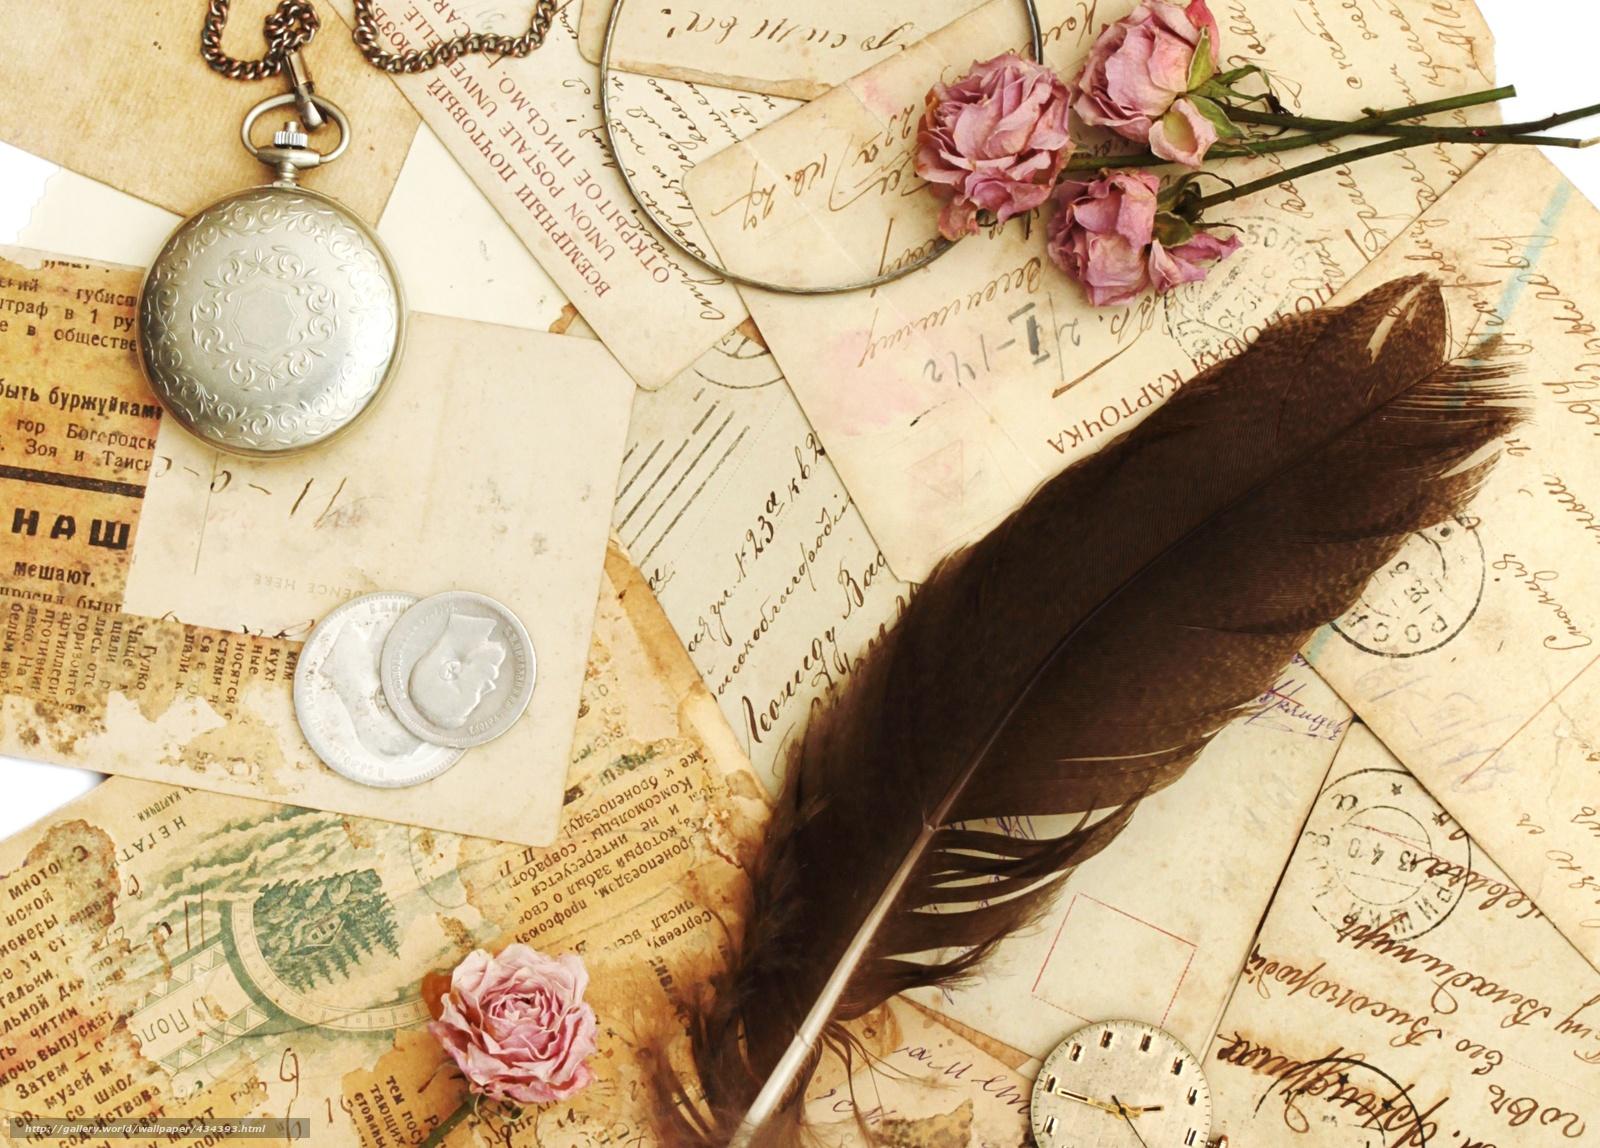 Pisem ti pismo... 434393_vintazh_kartochki_otkrytki_pisma_pero_rozy_suxie_c_2635x1890